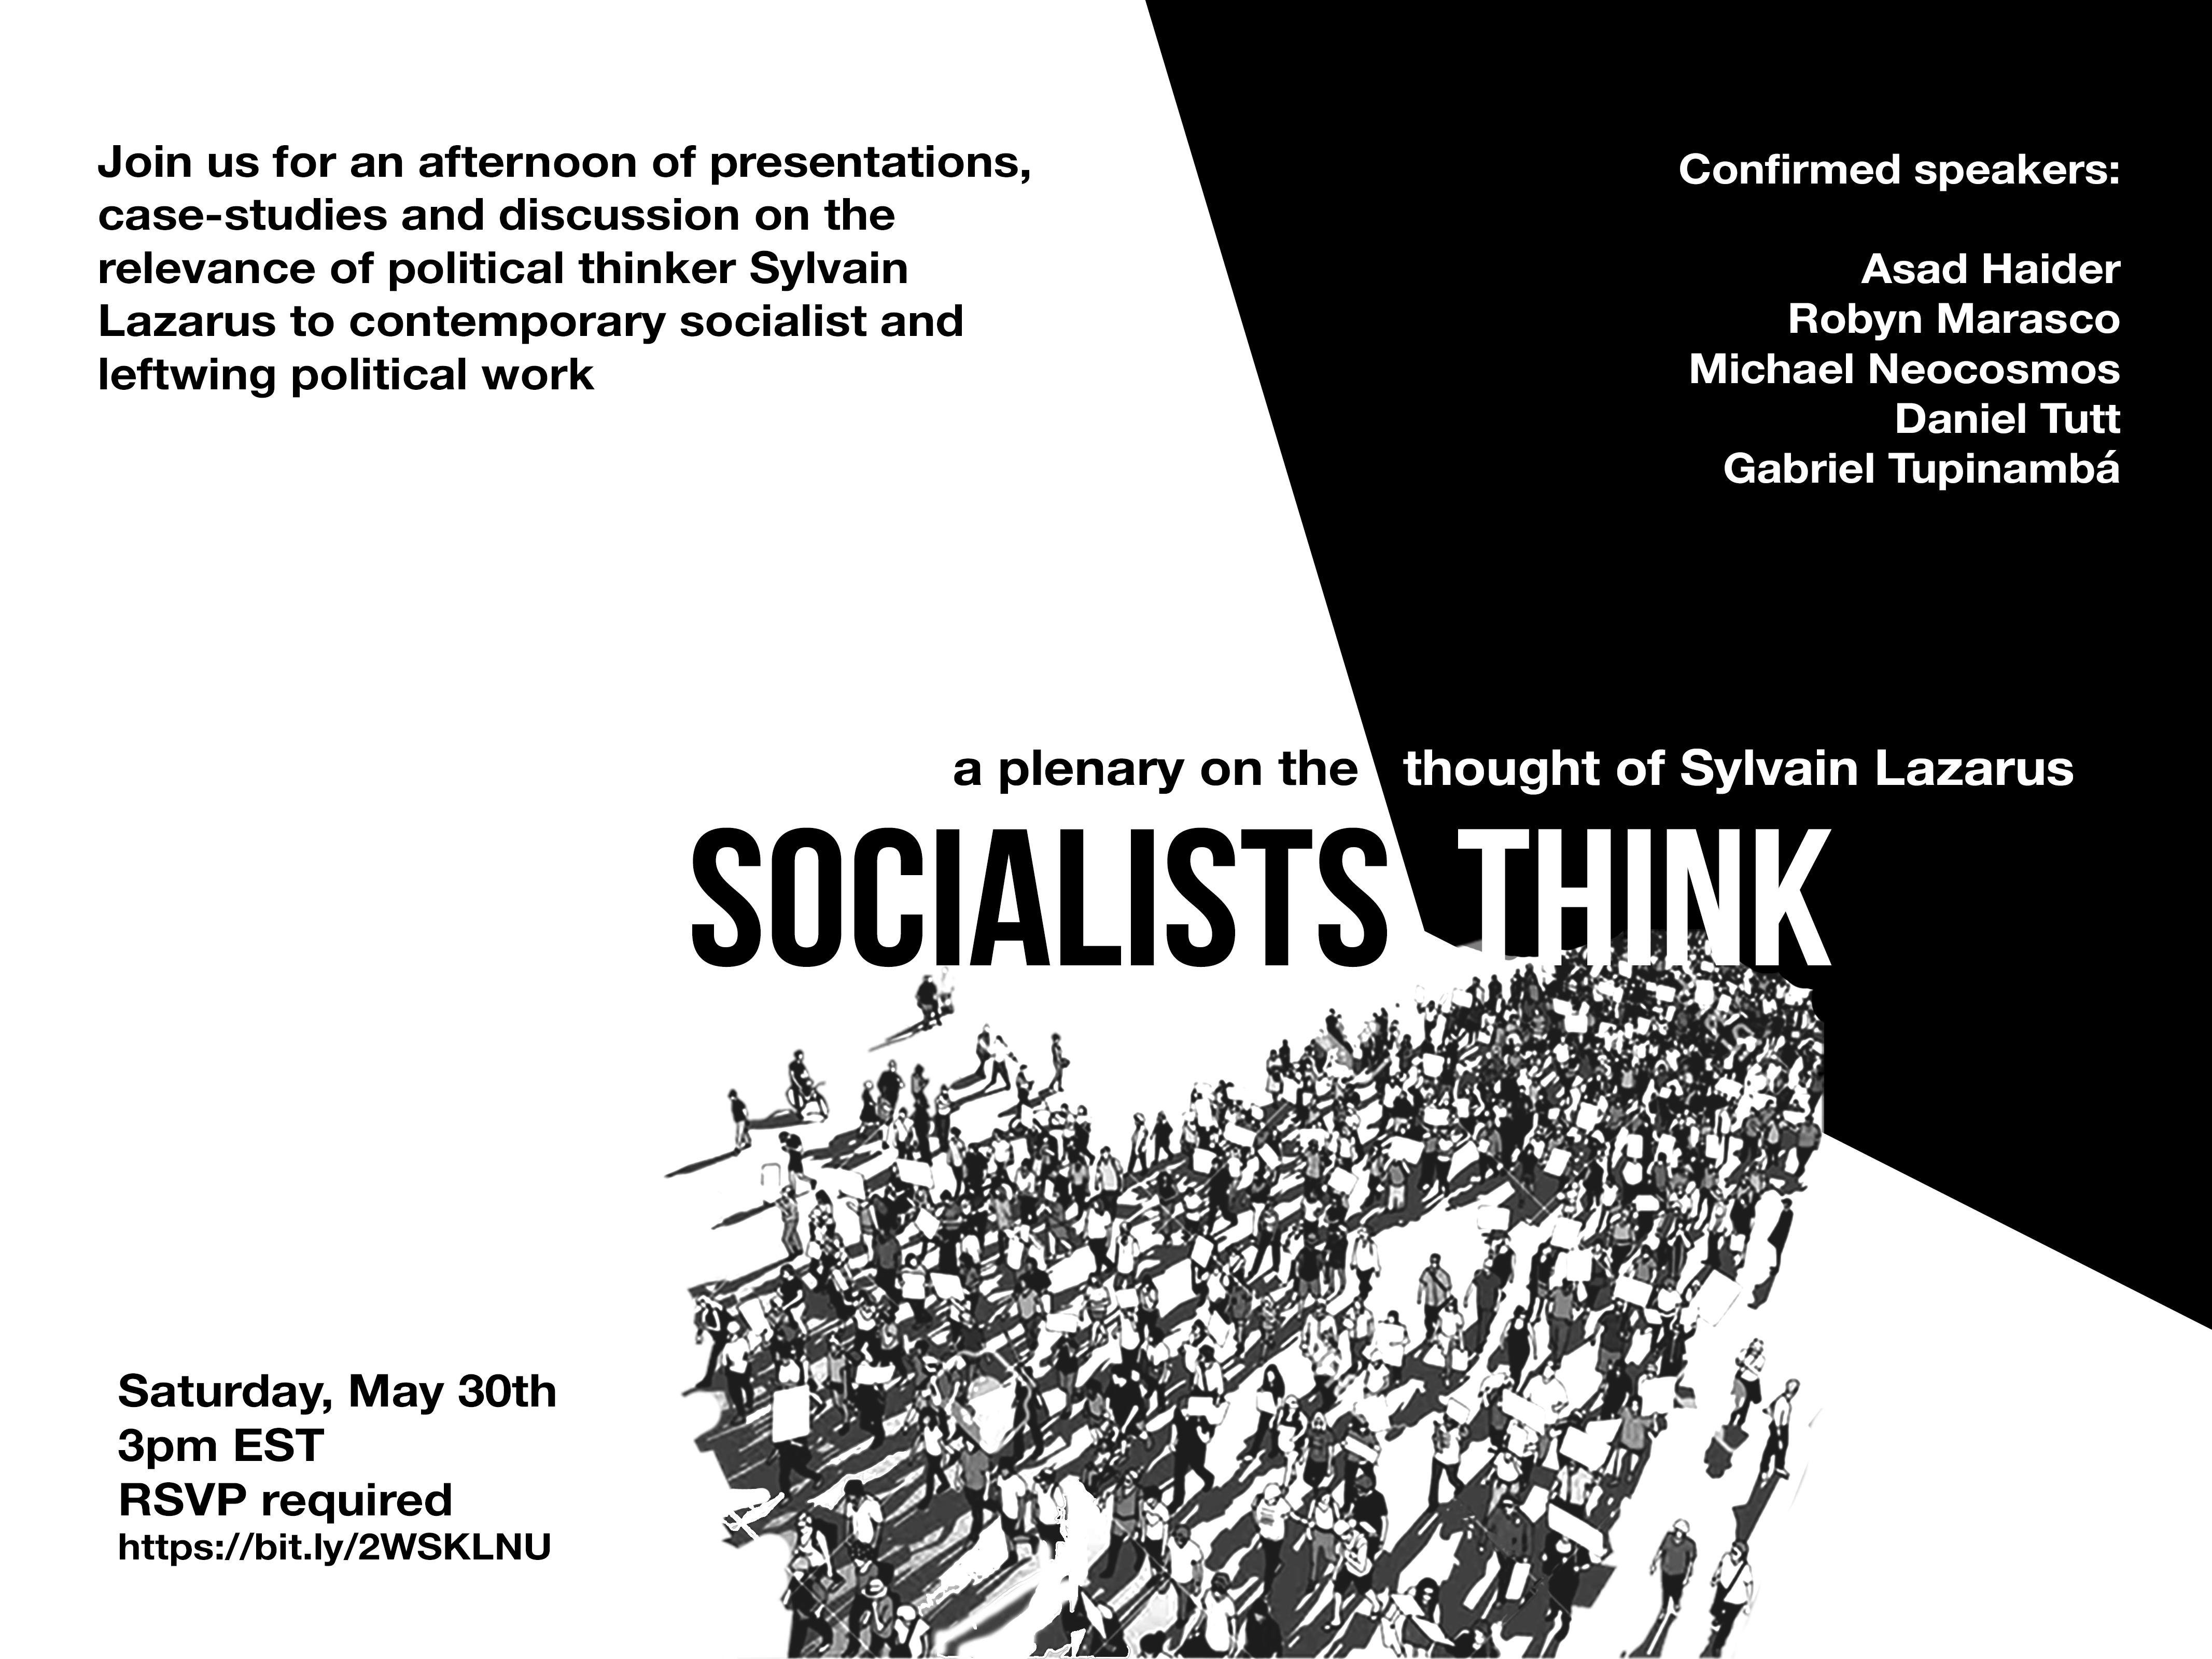 Socialists Thinknew